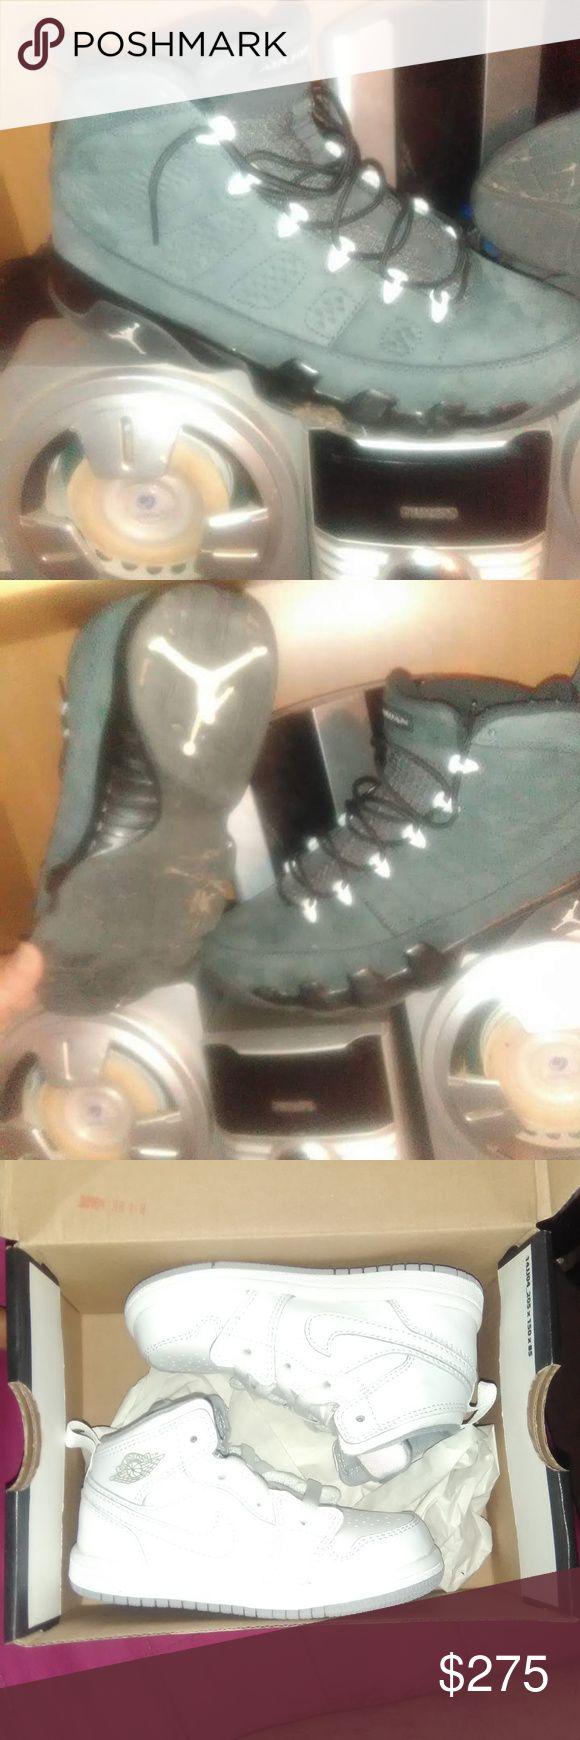 Jordans Retro cougar 9s n White jordan the 1s wearn 3timez size 11   the white jordan 1s  brand new never used size 7c Jordan Shoes Sneakers